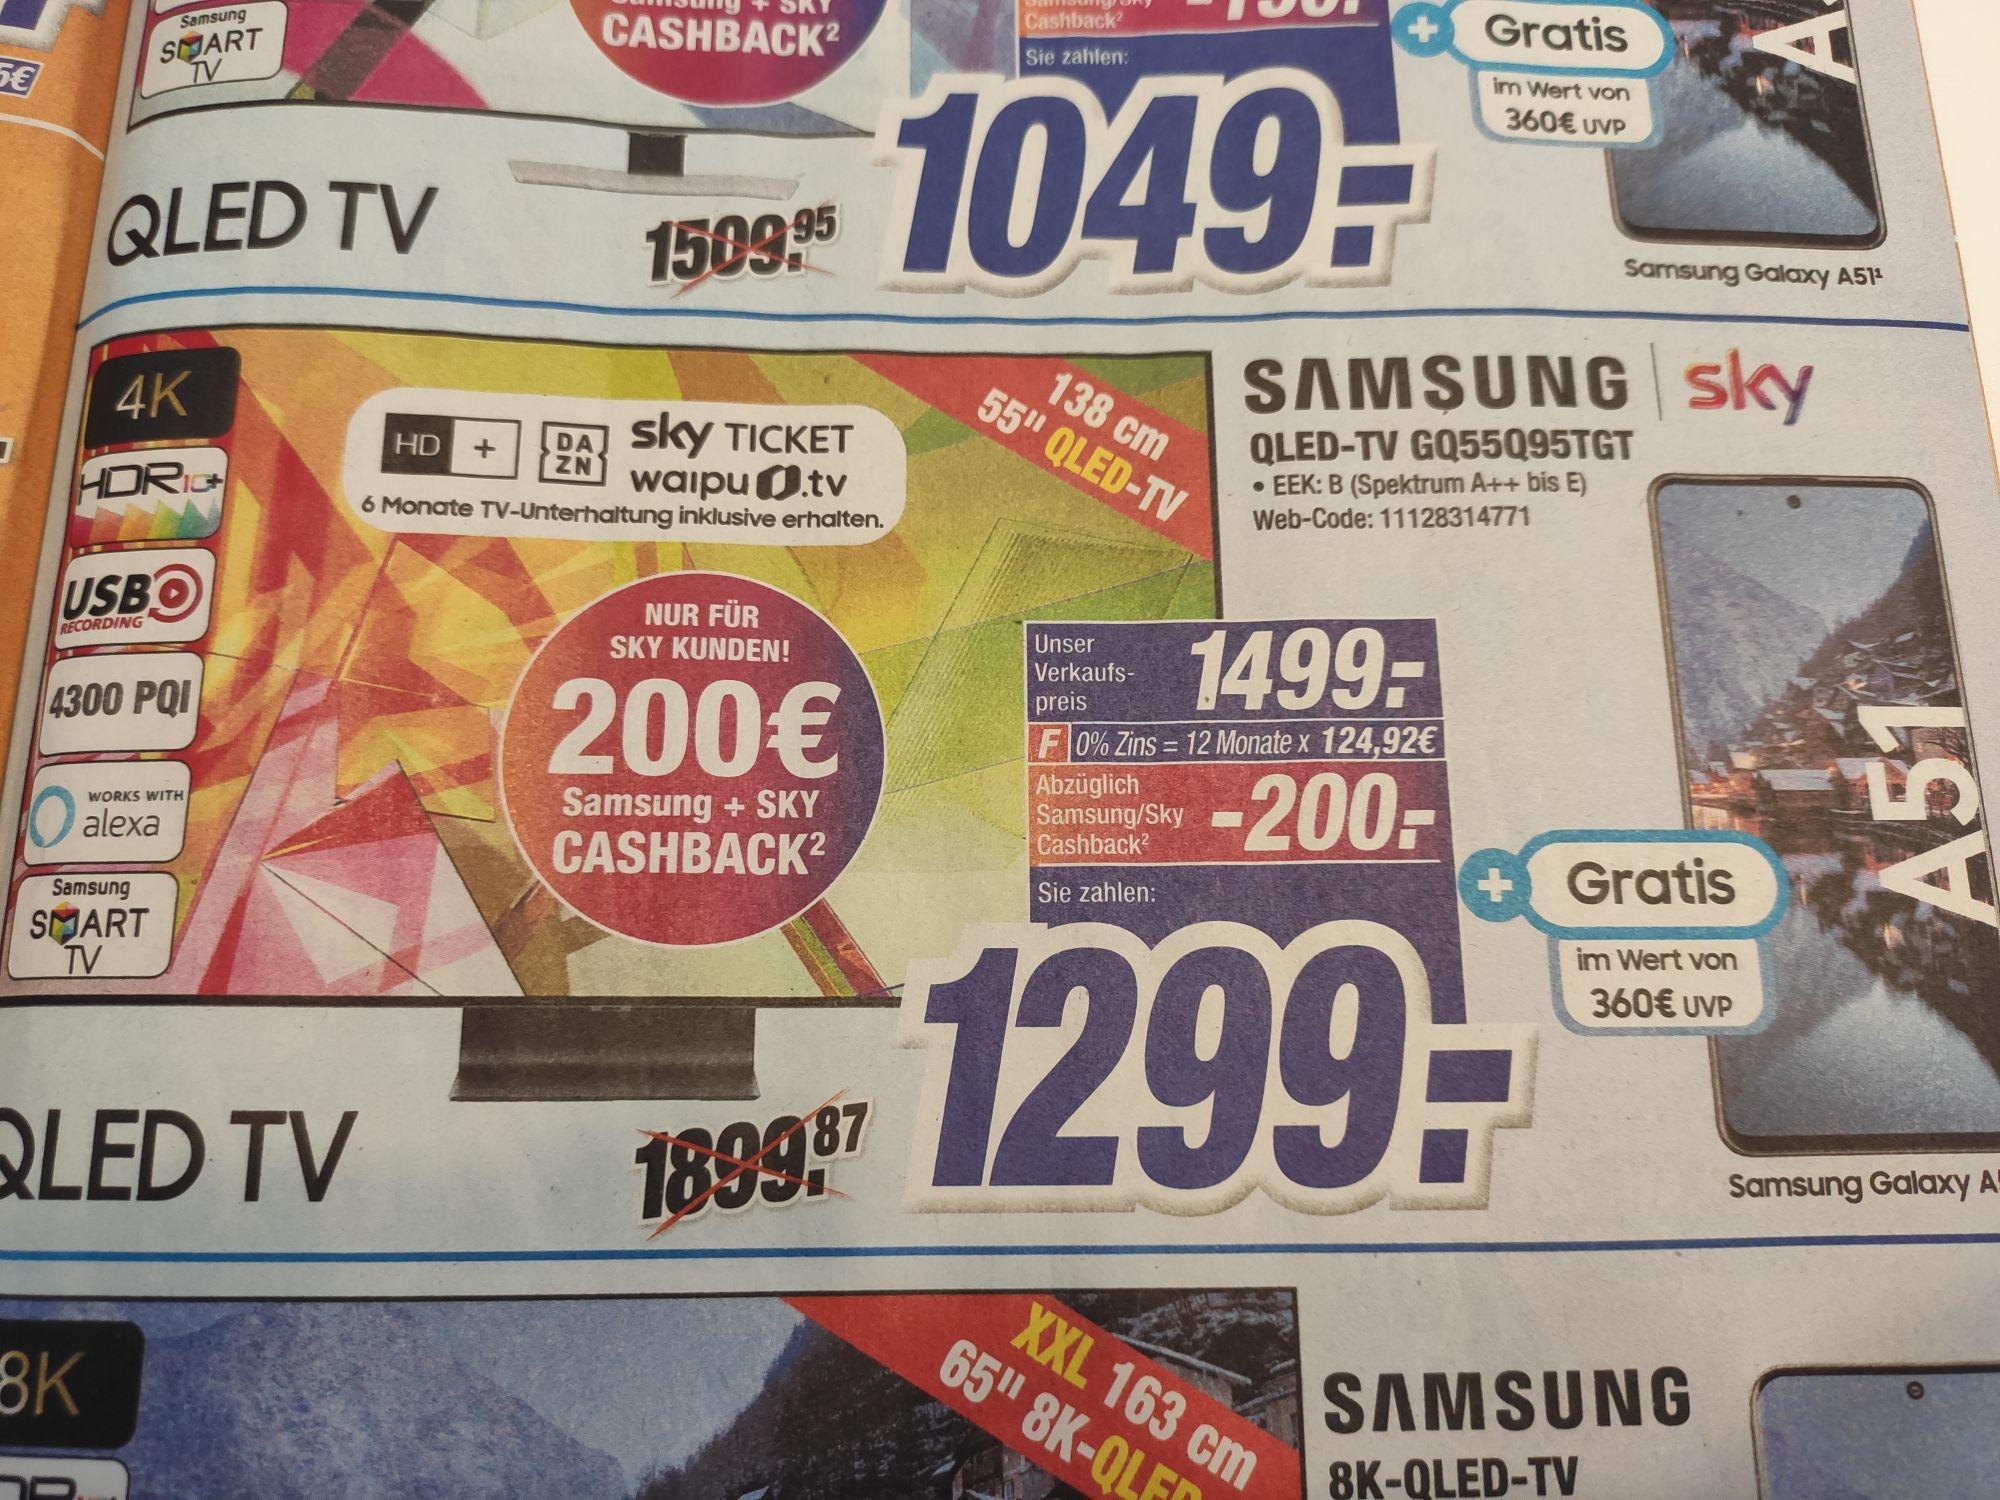 (Expert Klein) Samsung QLED-TV GQ55Q95TGT zzgl. Samsung A51 (Superdeal) und ggf. Sky Cashback